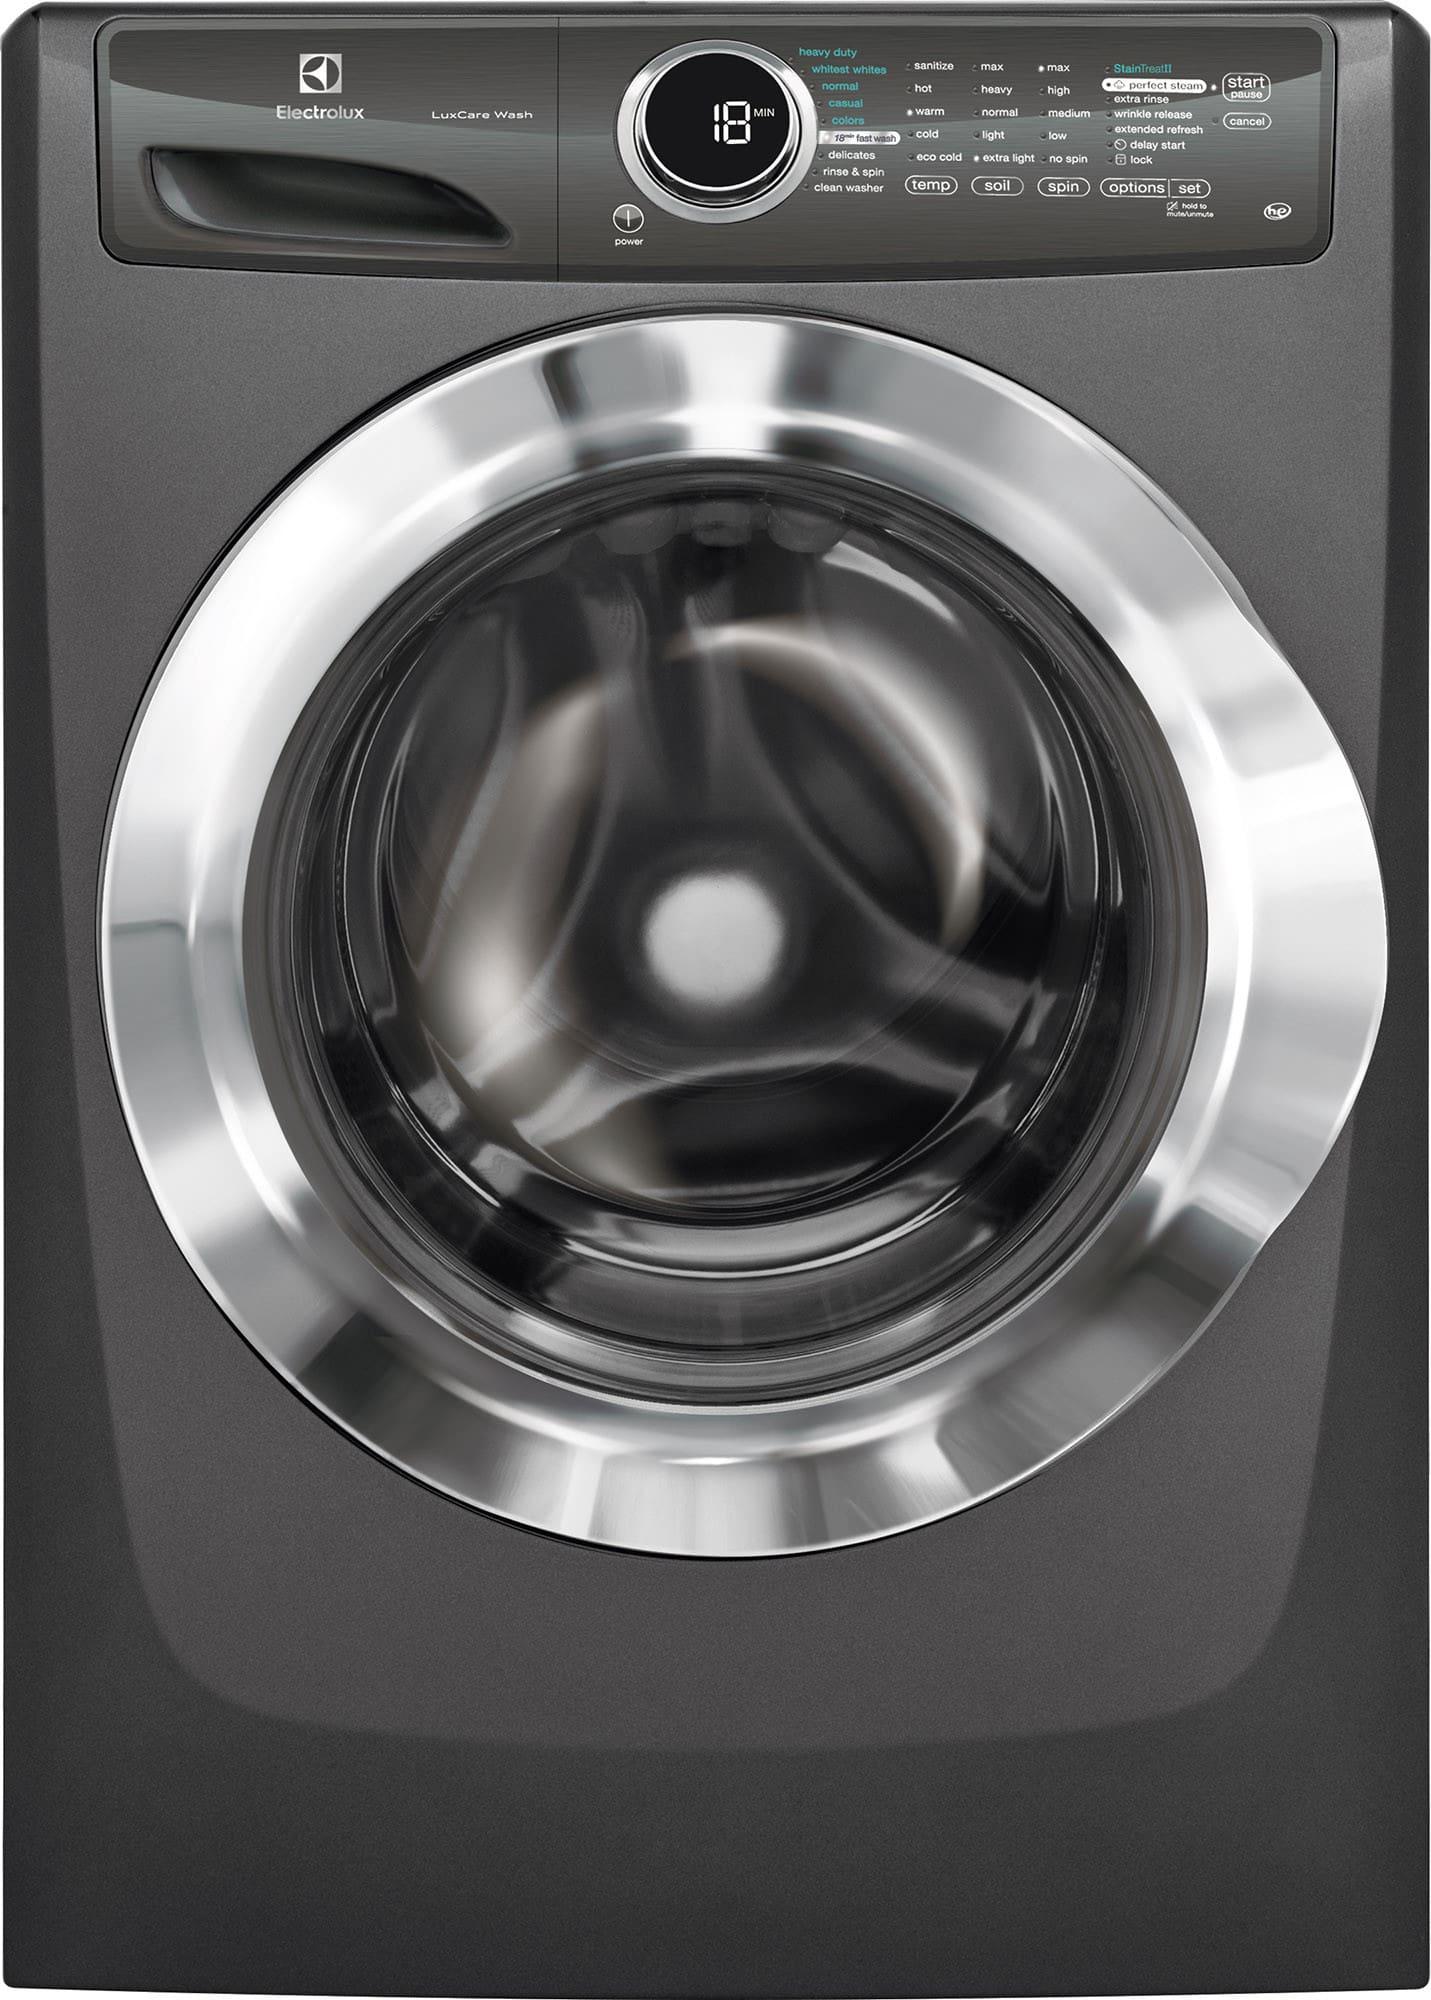 washer amazon appliances pedestals steam touch gas set front org load epfbalancestatus iq pedestal dryer laundry and electrolux x silver com w